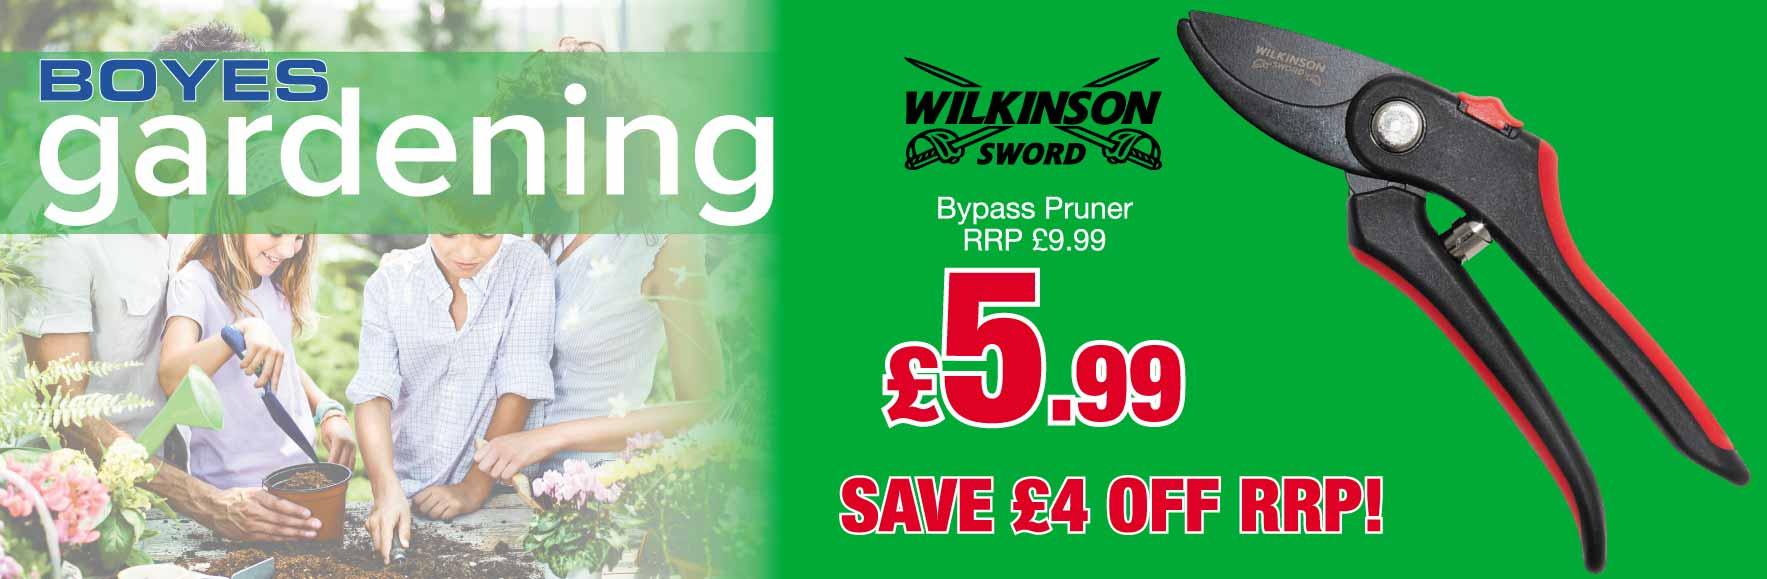 'Wilkinson Sword' Bypass Pruner. RRP £9.99 ONLY £5.99